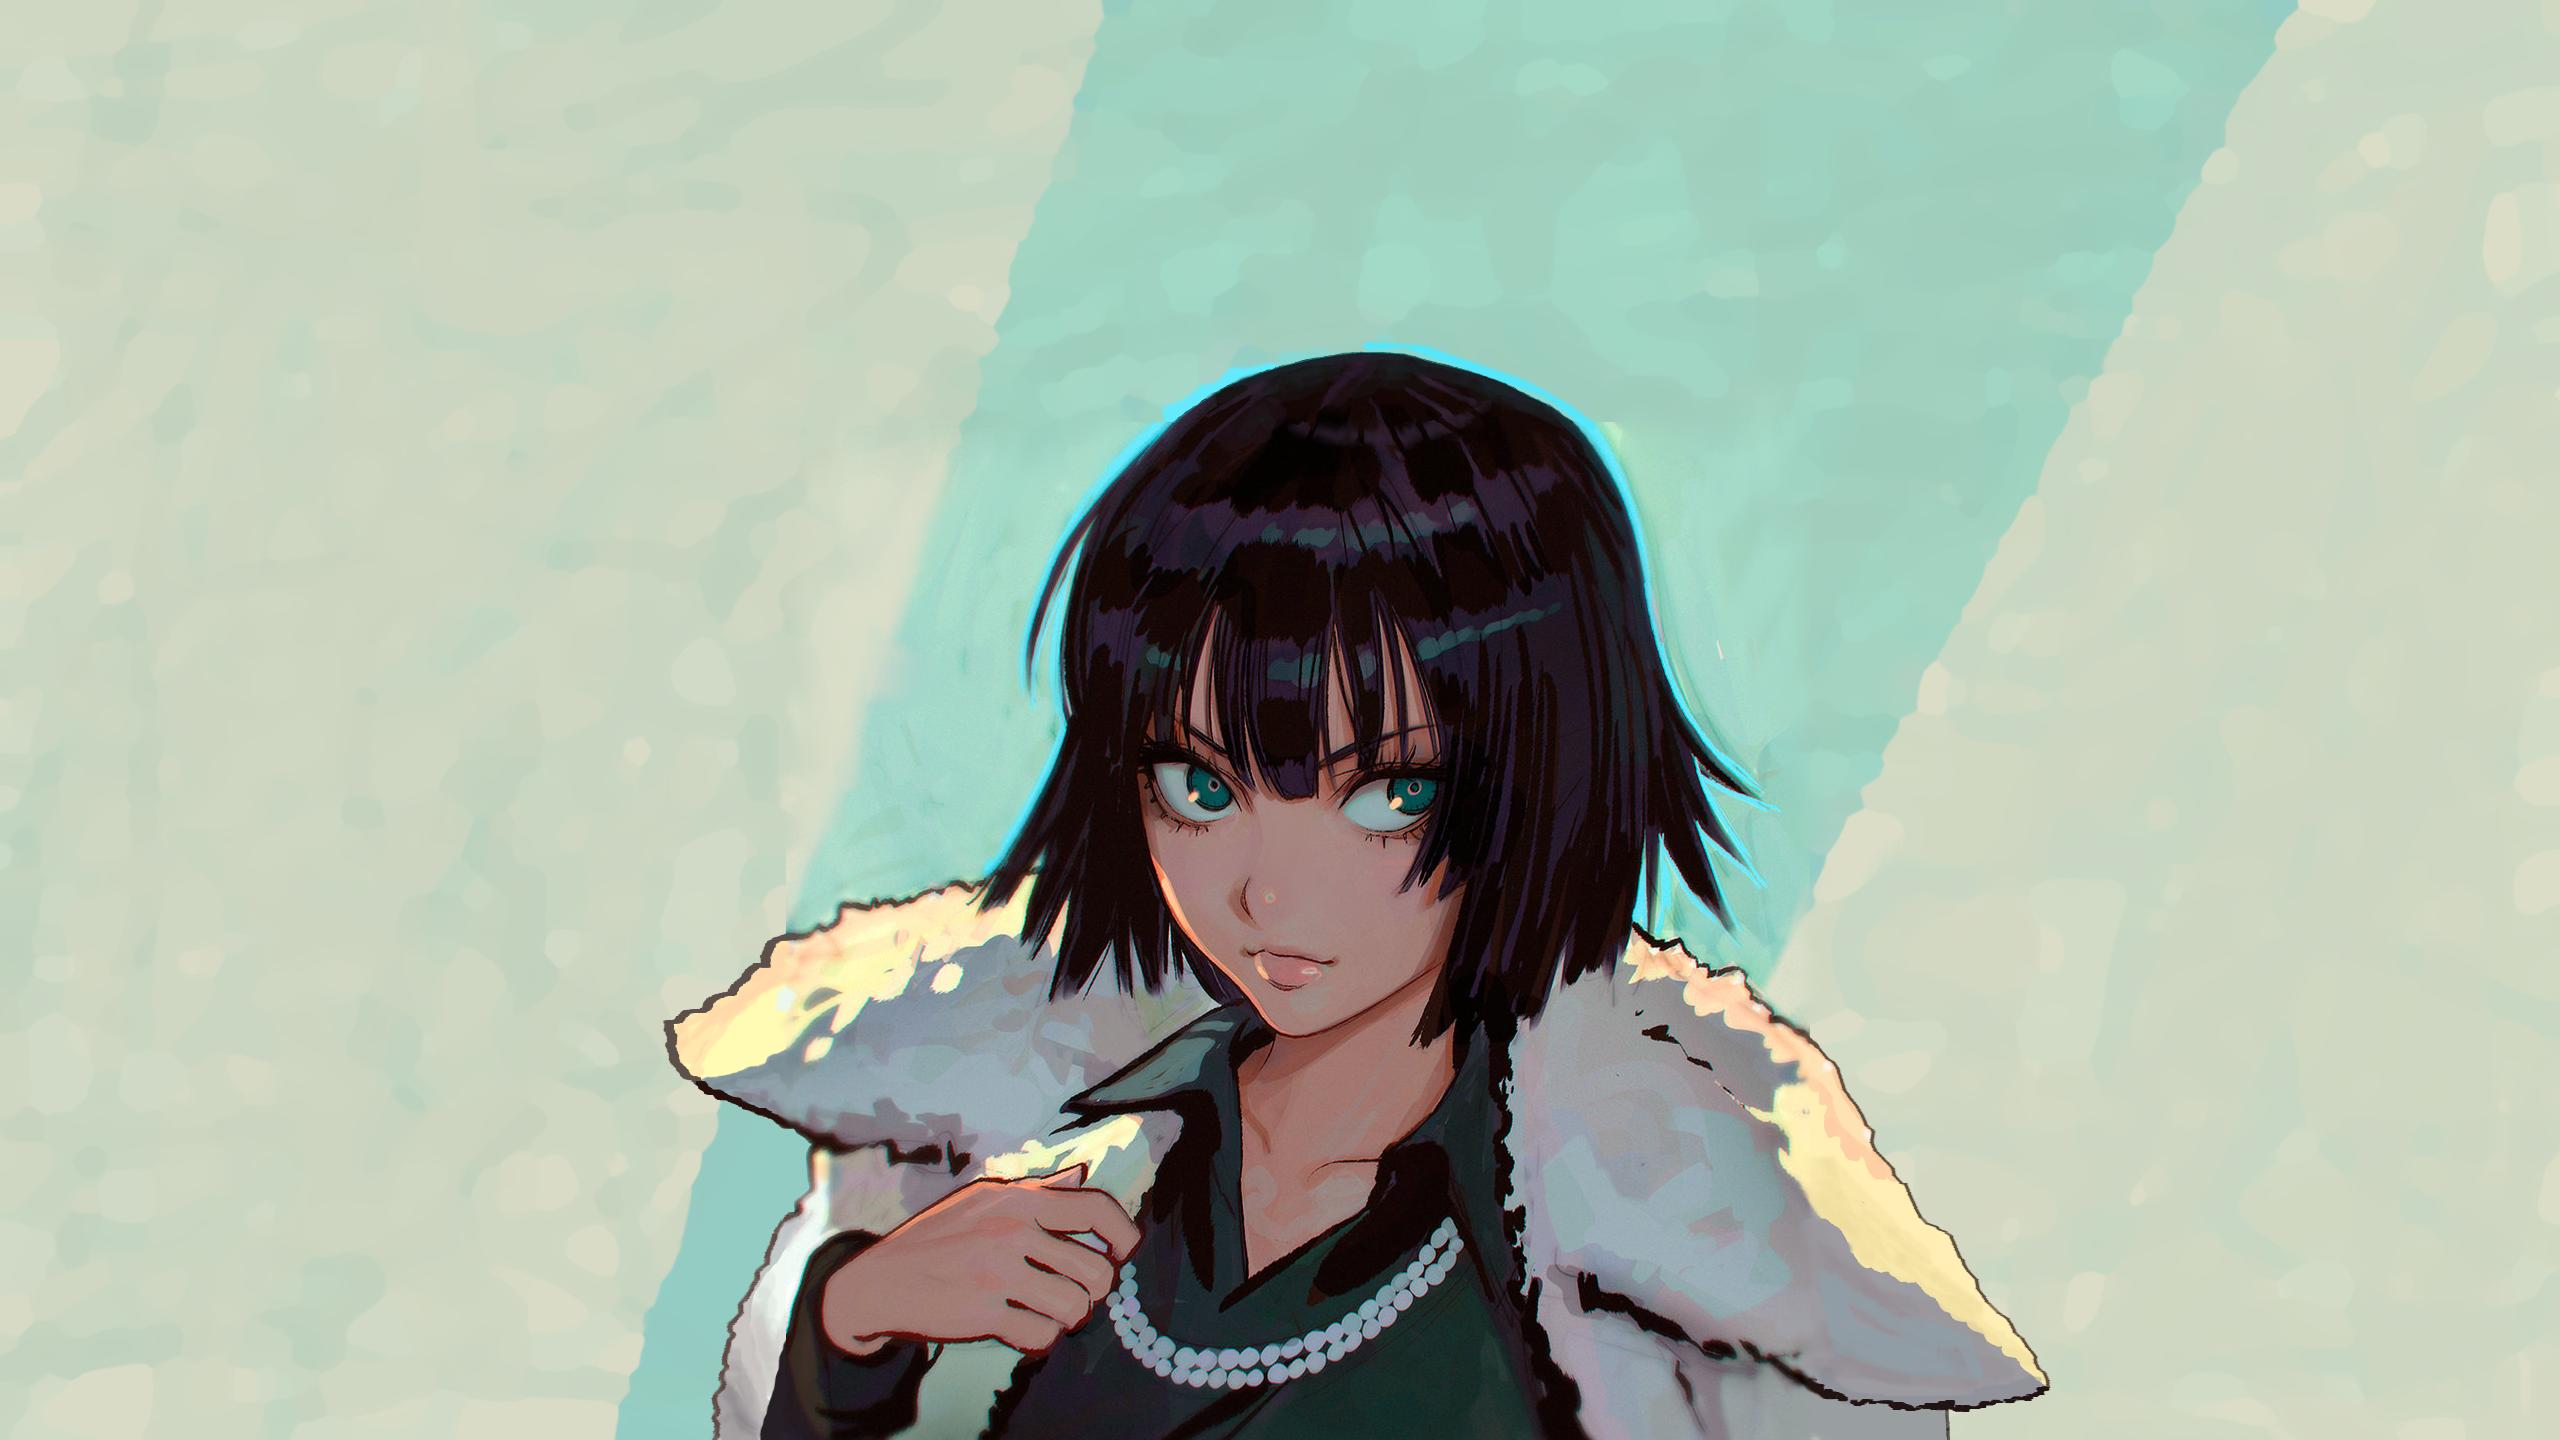 Wallpaper Anime Girls One Punch Man Fubuki Coats Black